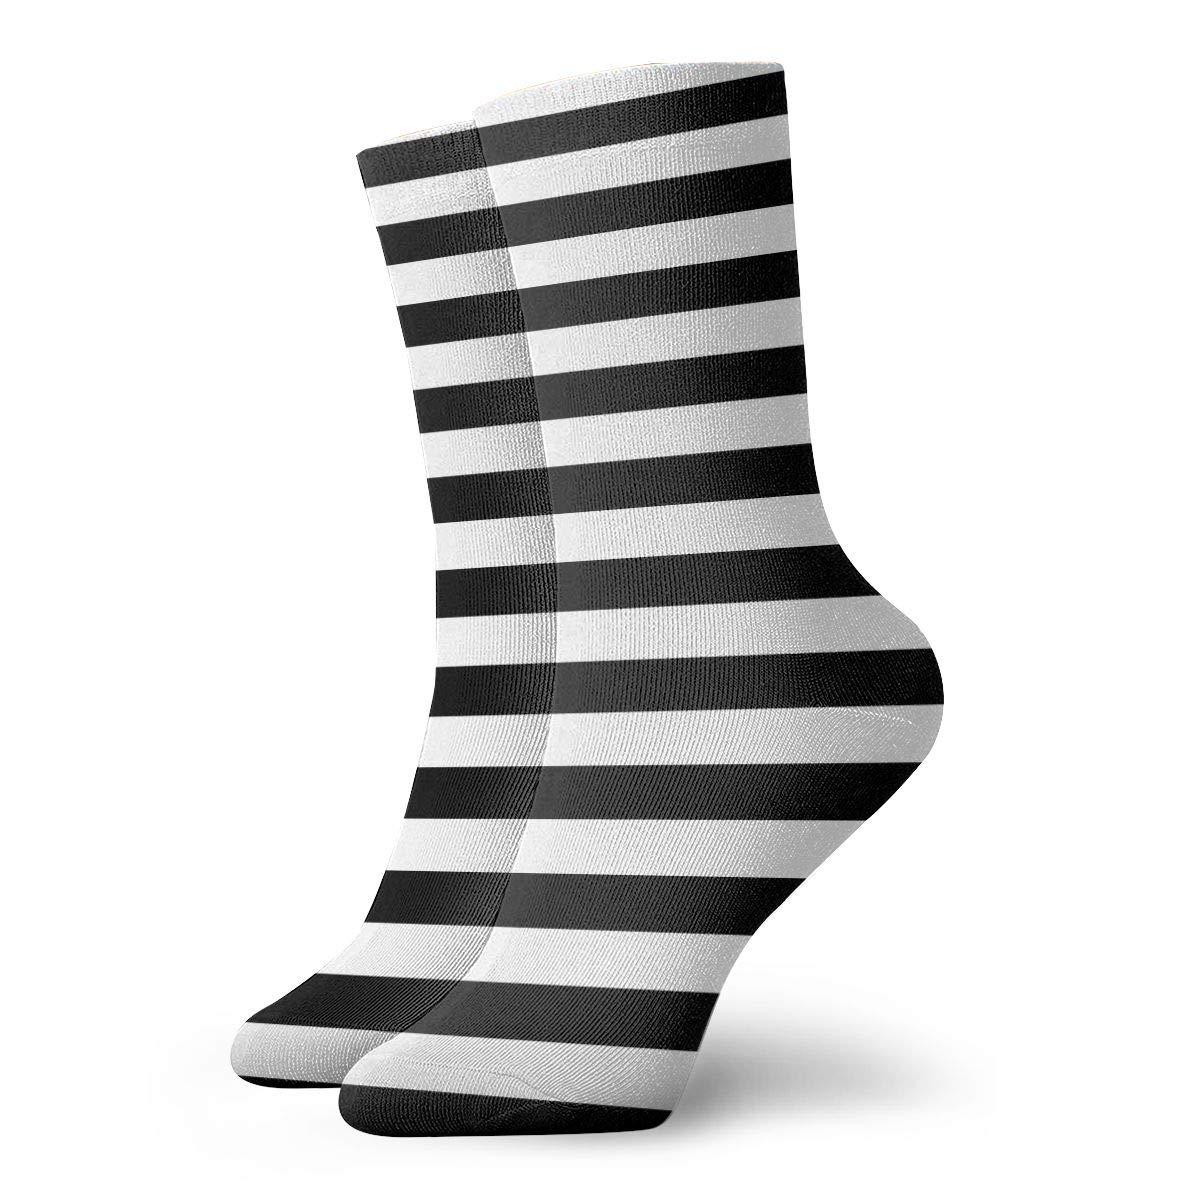 Fashion Unisex Casual Cotton Socks Black and White Striped Mens Women/'s Socks